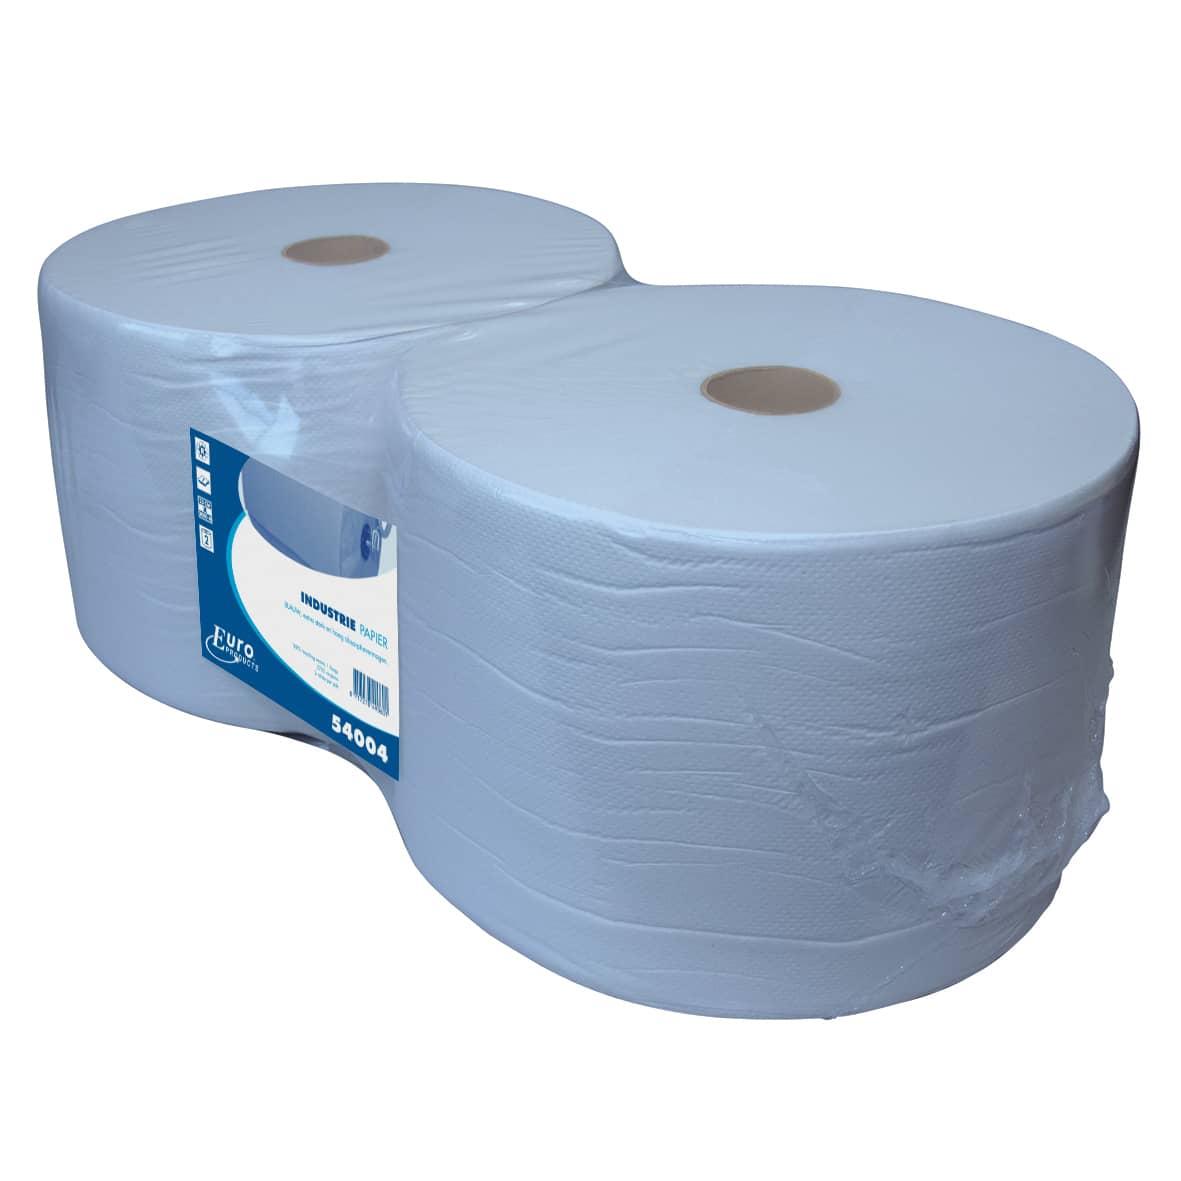 Poetspapier recycled blauw - 37cm x 380m (2 rollen)